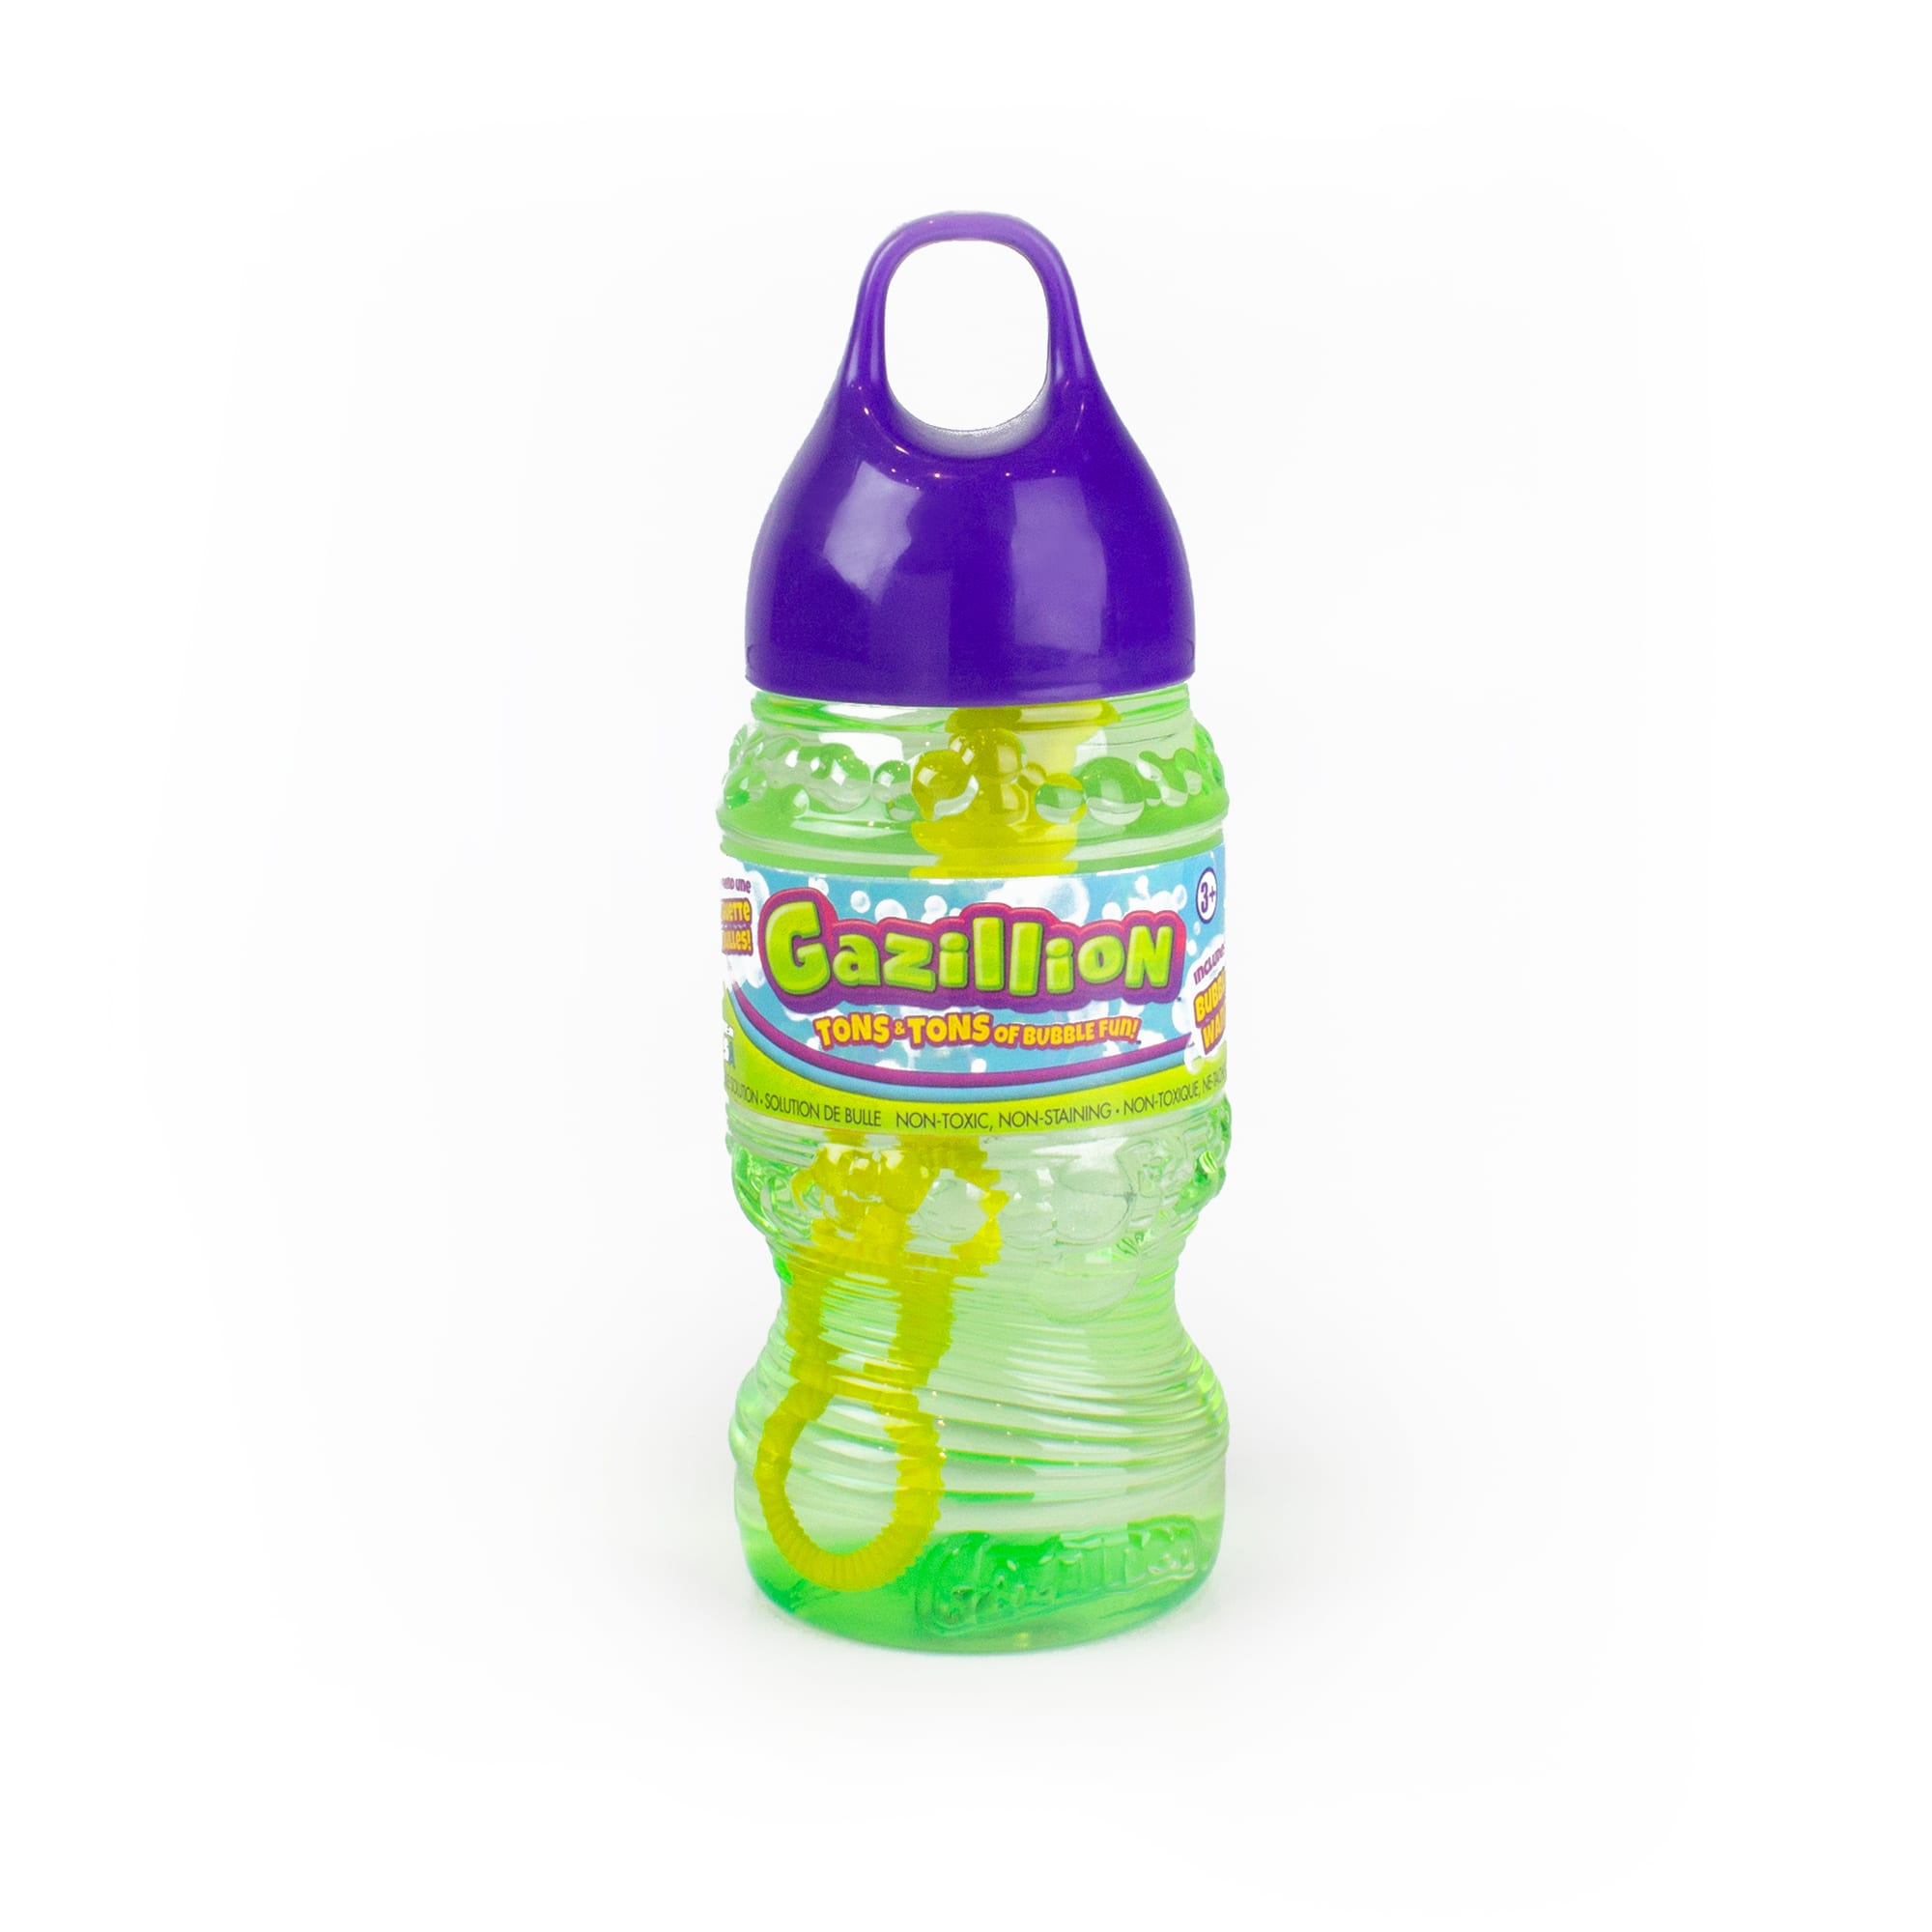 2-Liter Gazillion Bubble Solution